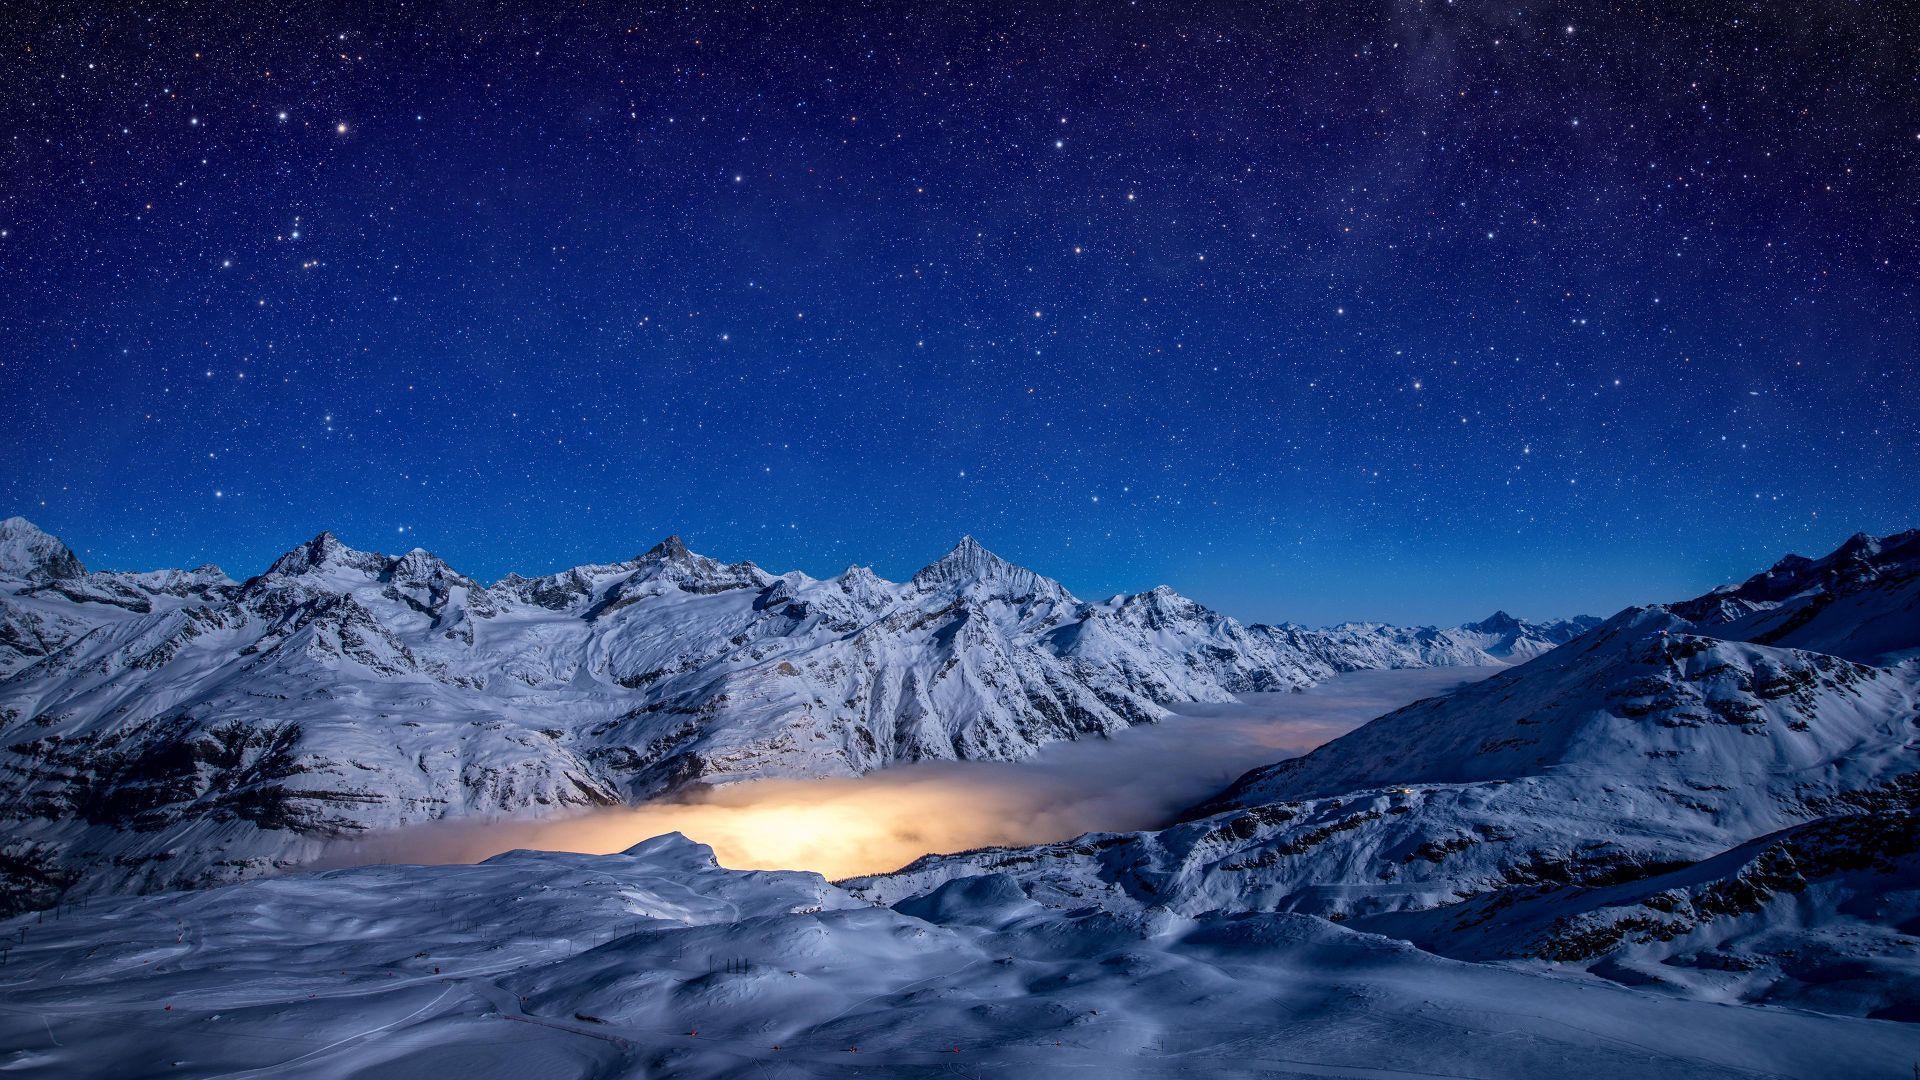 Night Mountains Sky Stars 4k Horizontal Sky Pictures Mountain Wallpaper Night Skies